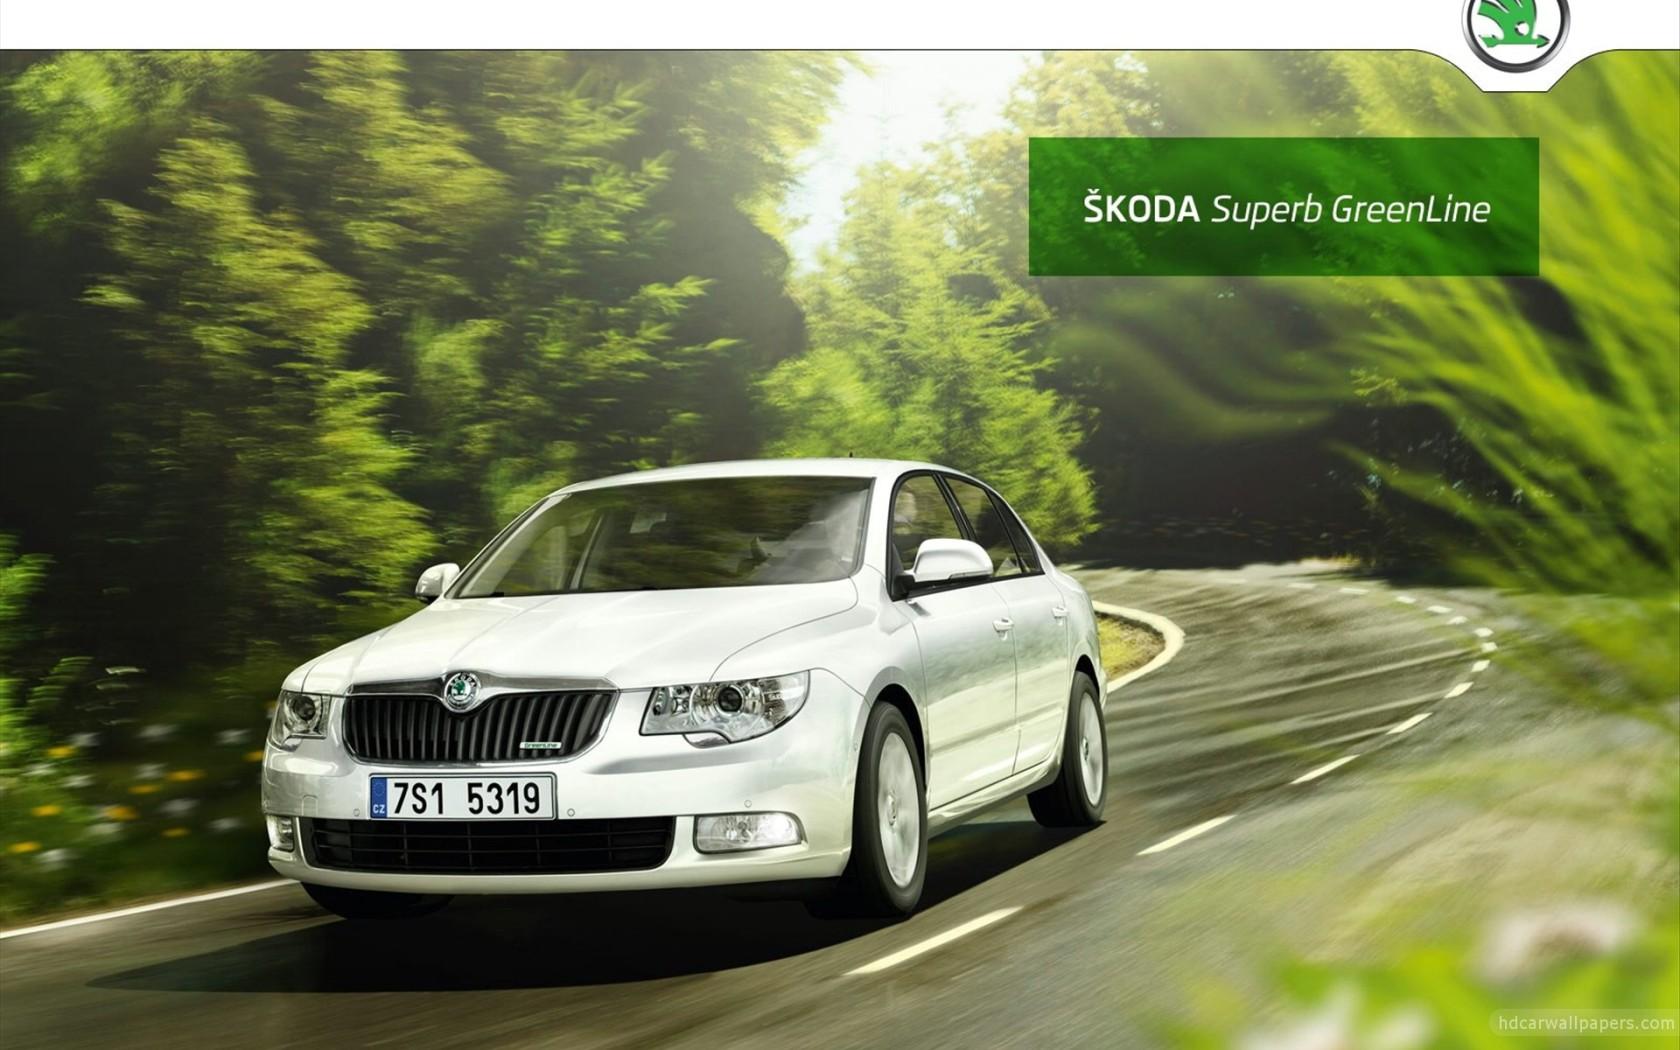 2011 Skoda Superb GreenLine Wallpaper in 1680x1050 Resolution